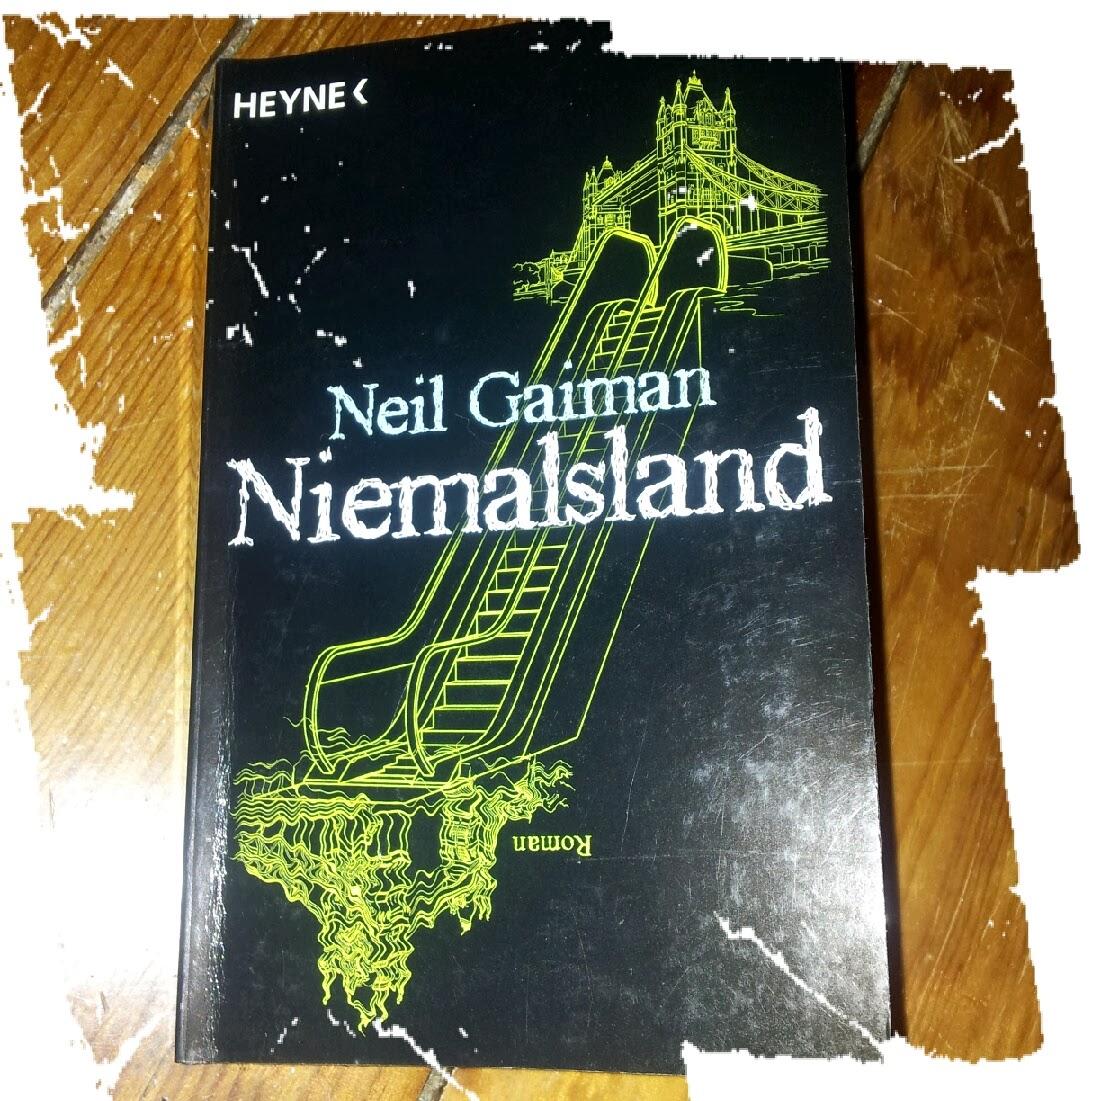 Niemalsland Neil Gaiman